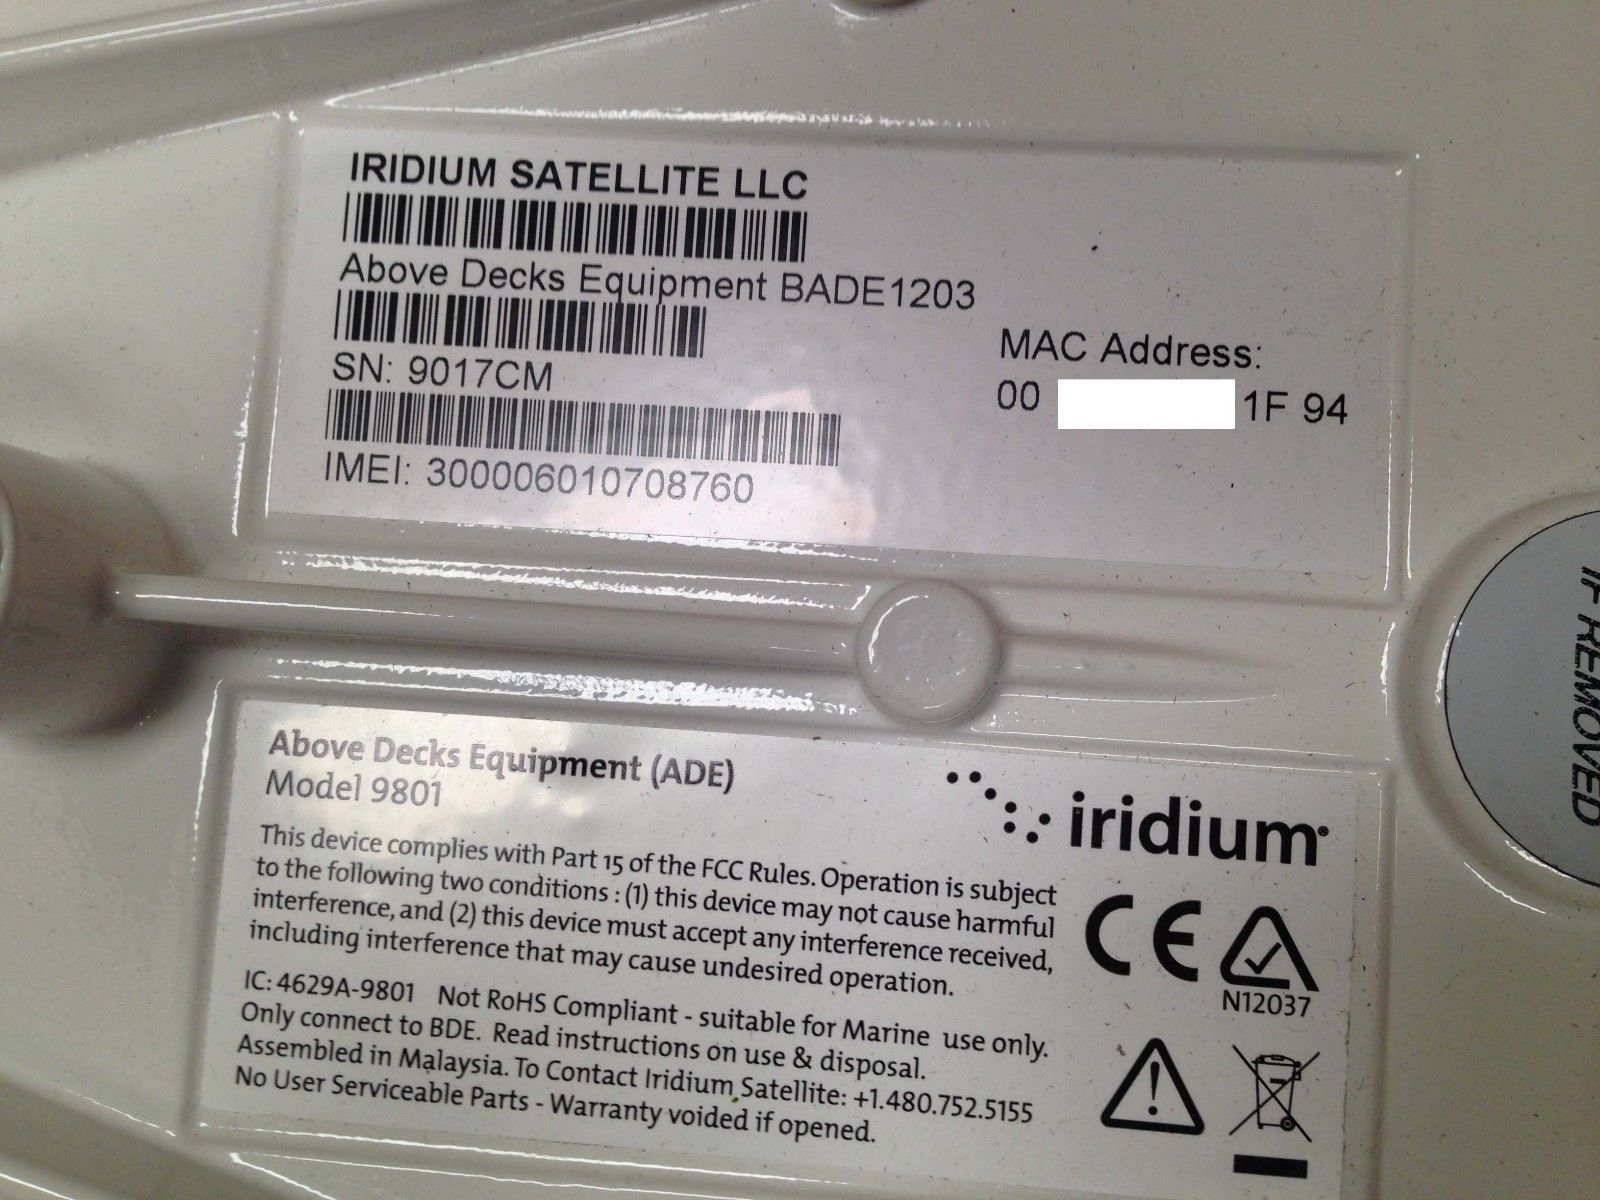 Set-of-iridium-pilot-Satellite-Decks-BADE1203-Below-Decks-Equipment-Model-9701_4